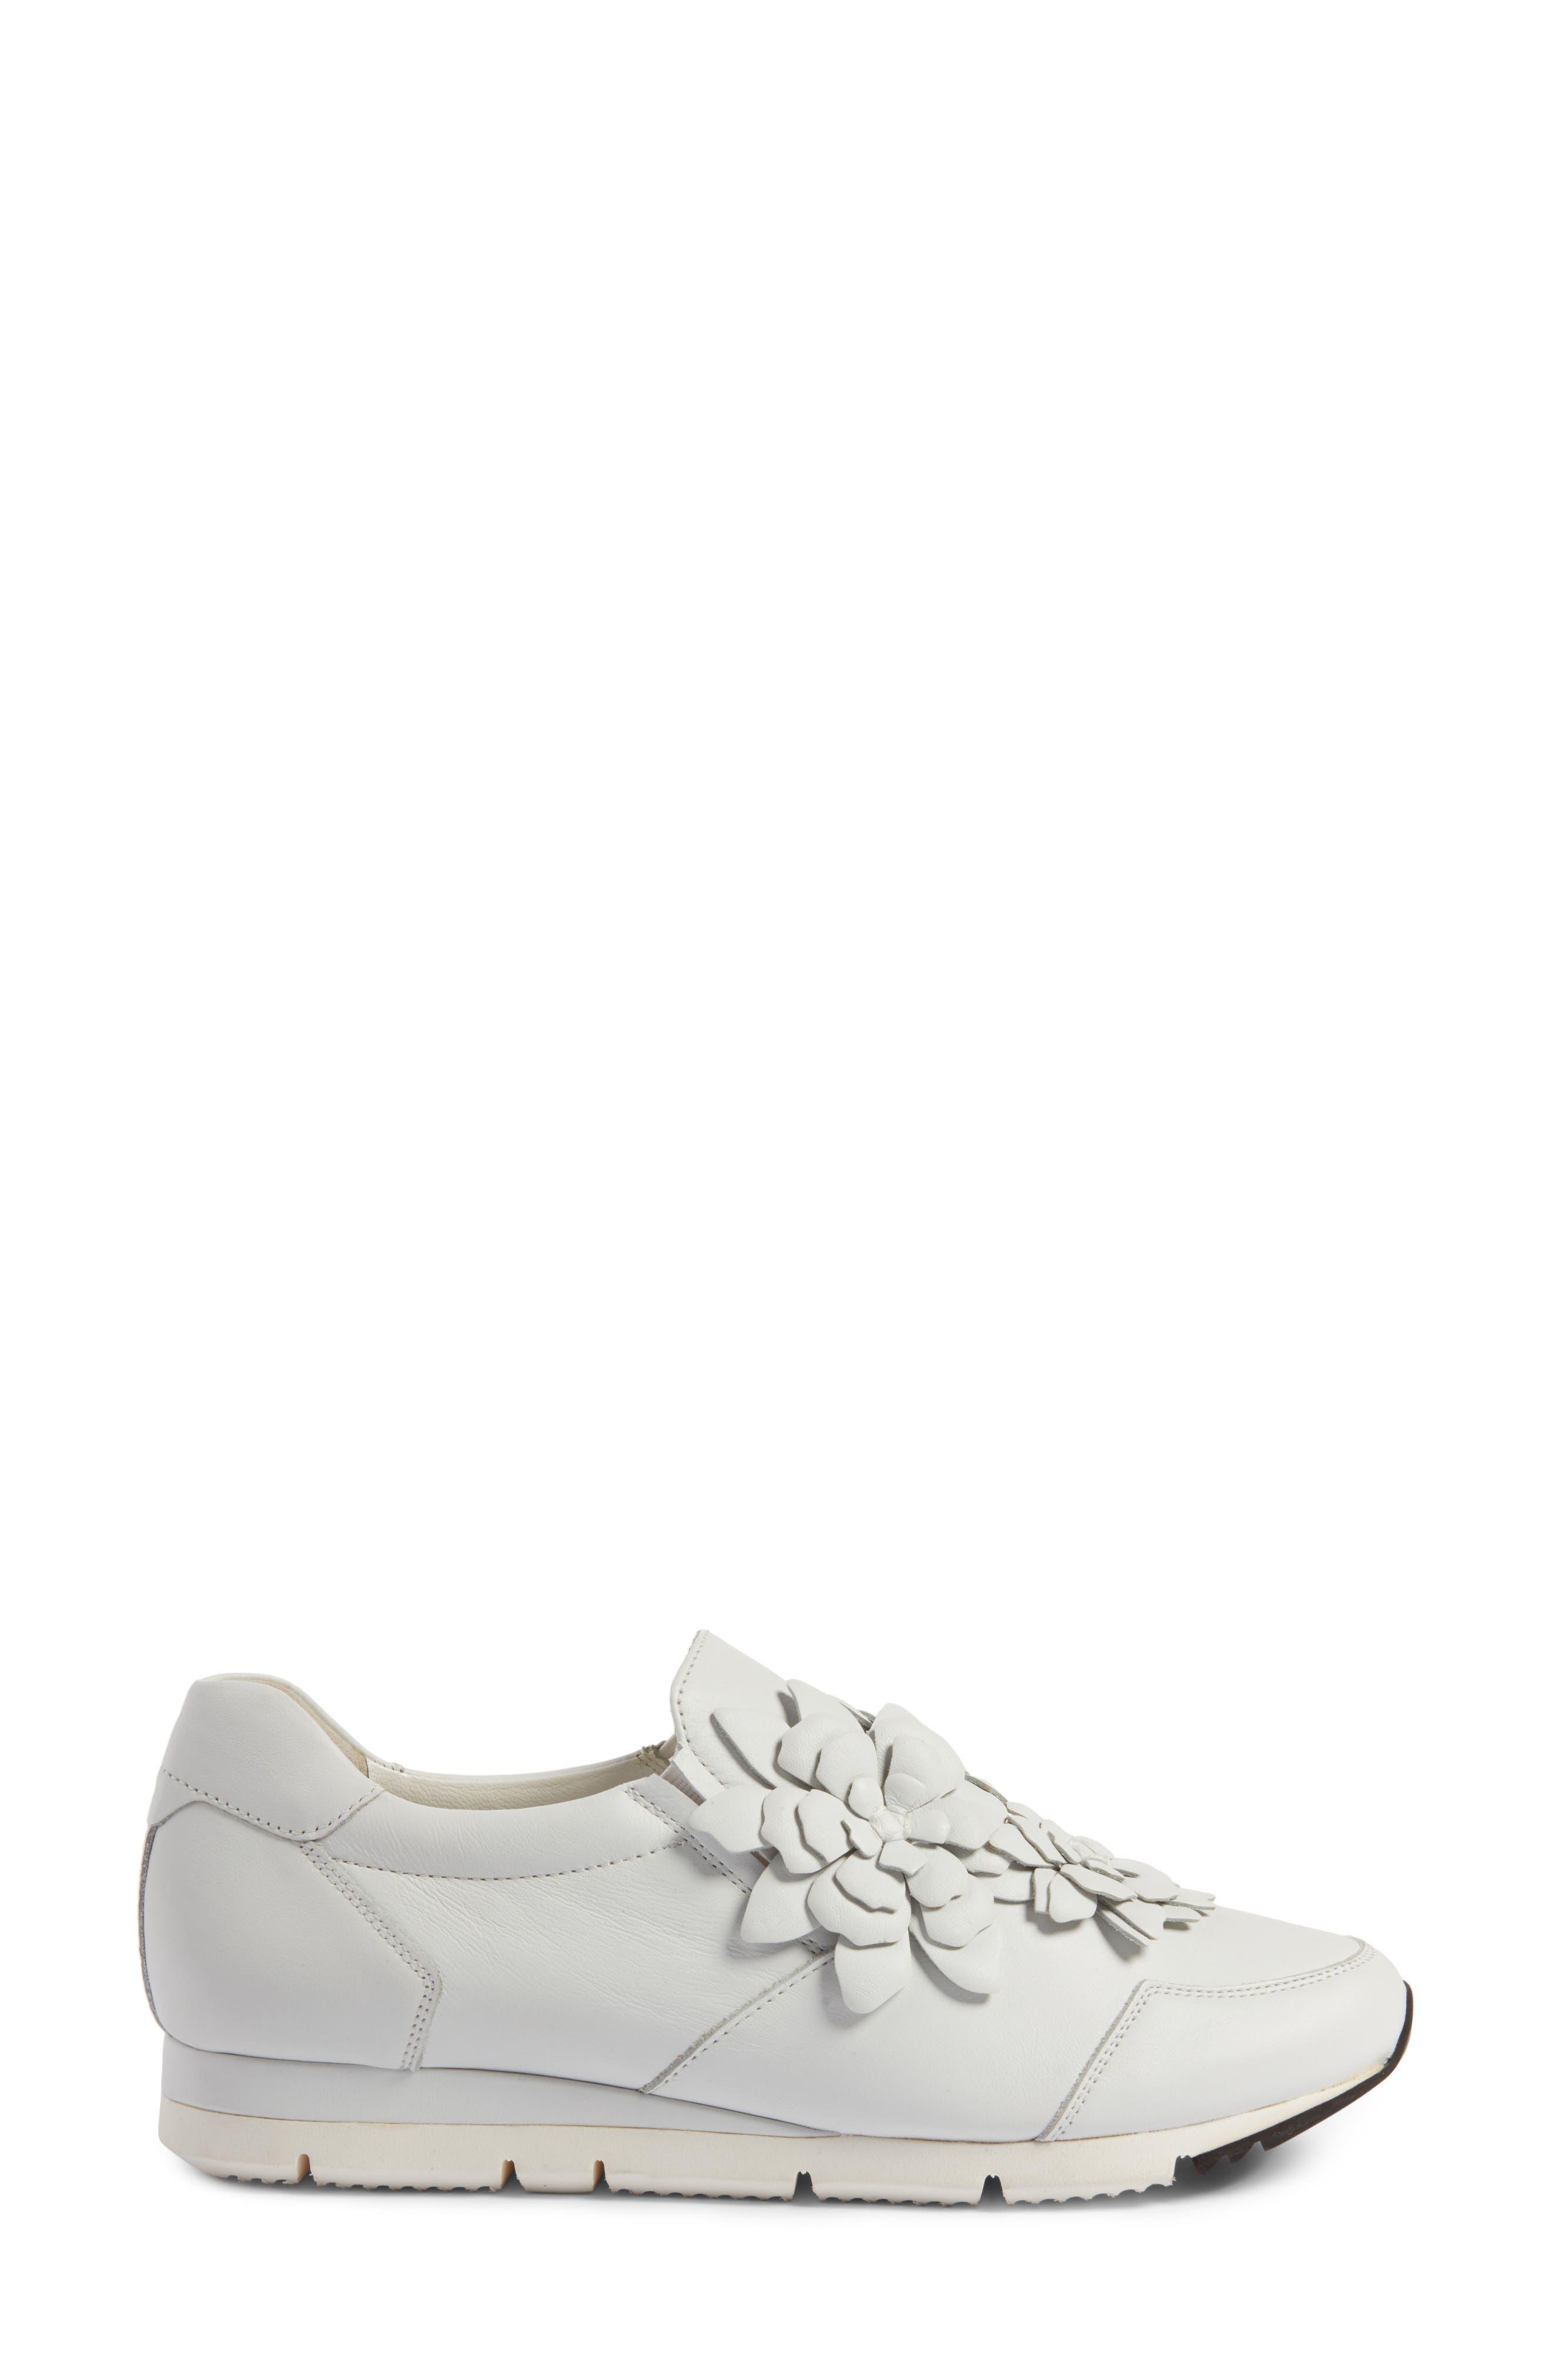 Alternate Image 3  - Kennel & Schmenger Tiger Flower Sneaker (Women)